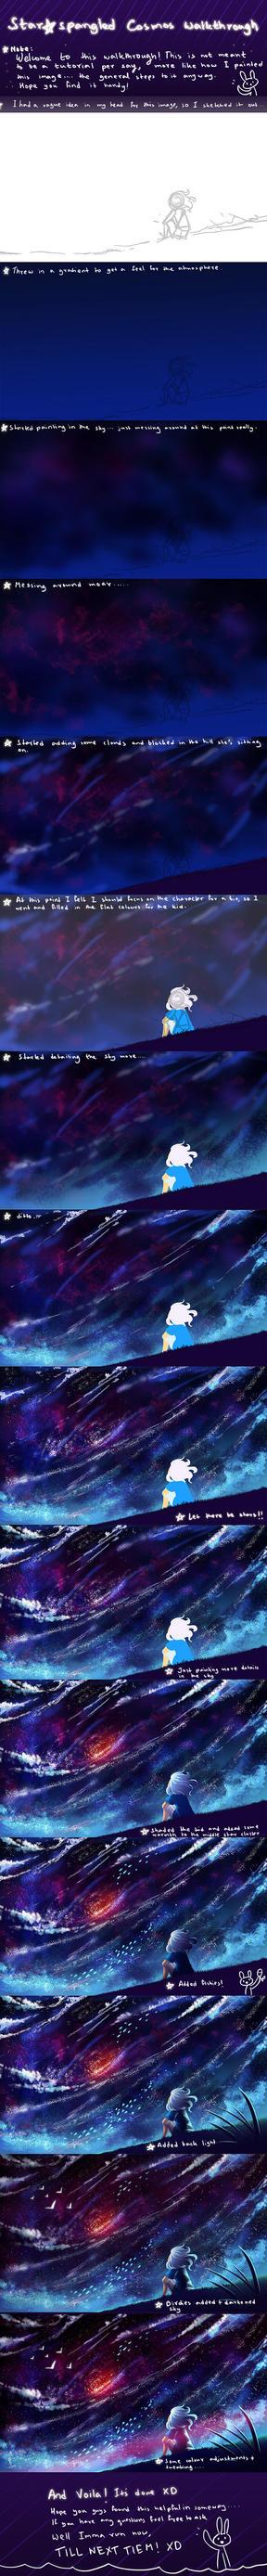 Star Spangled Cosmos - Walkthrough by Noxmoony